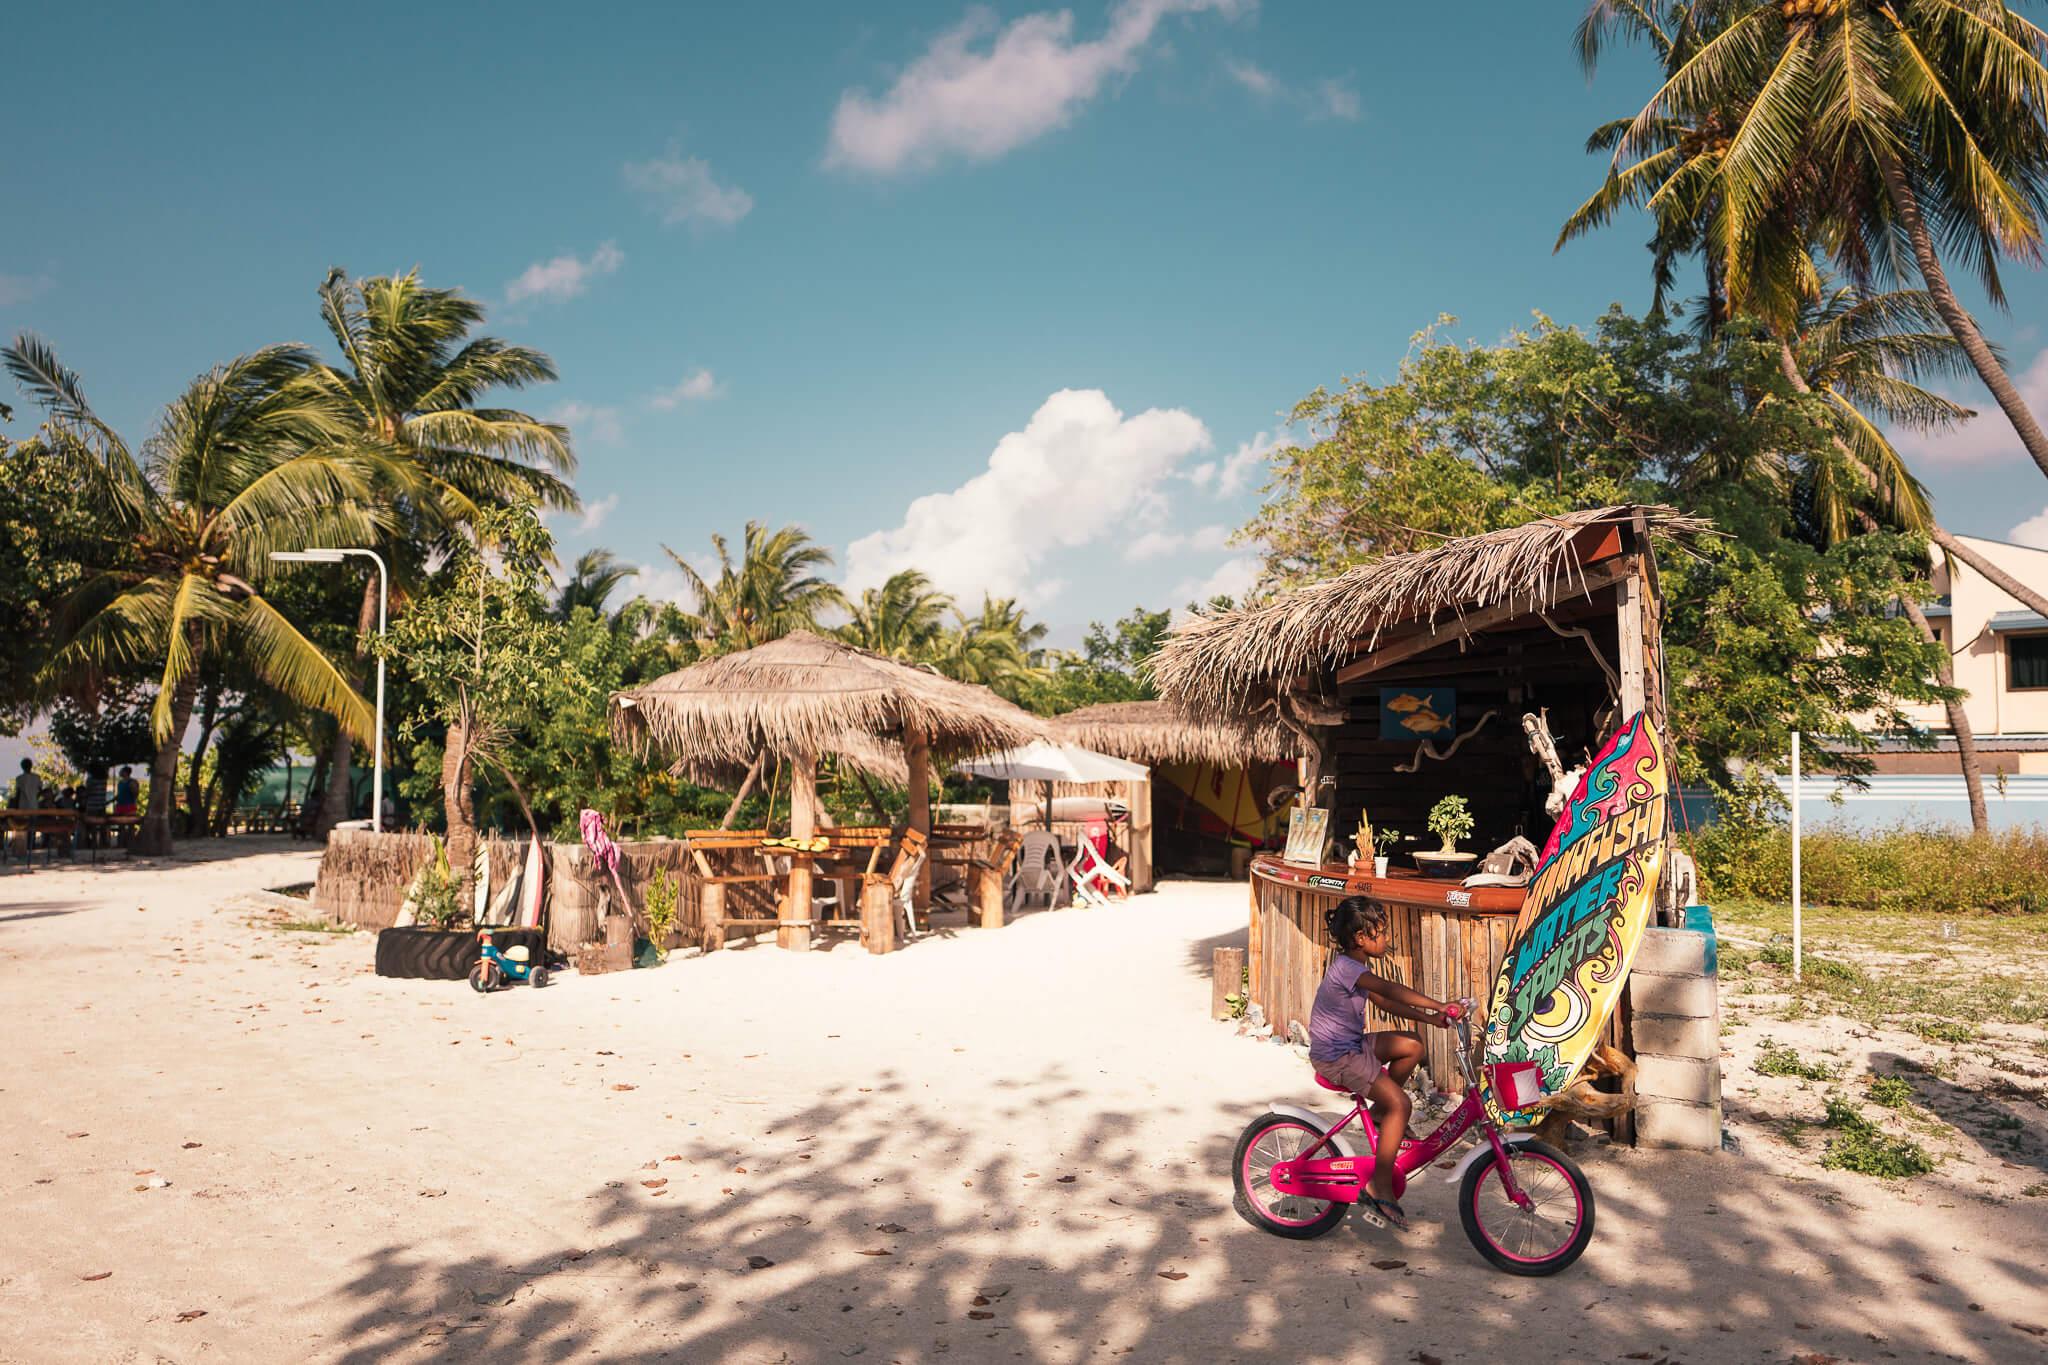 janni-deler-exploring-maldivesl1130522